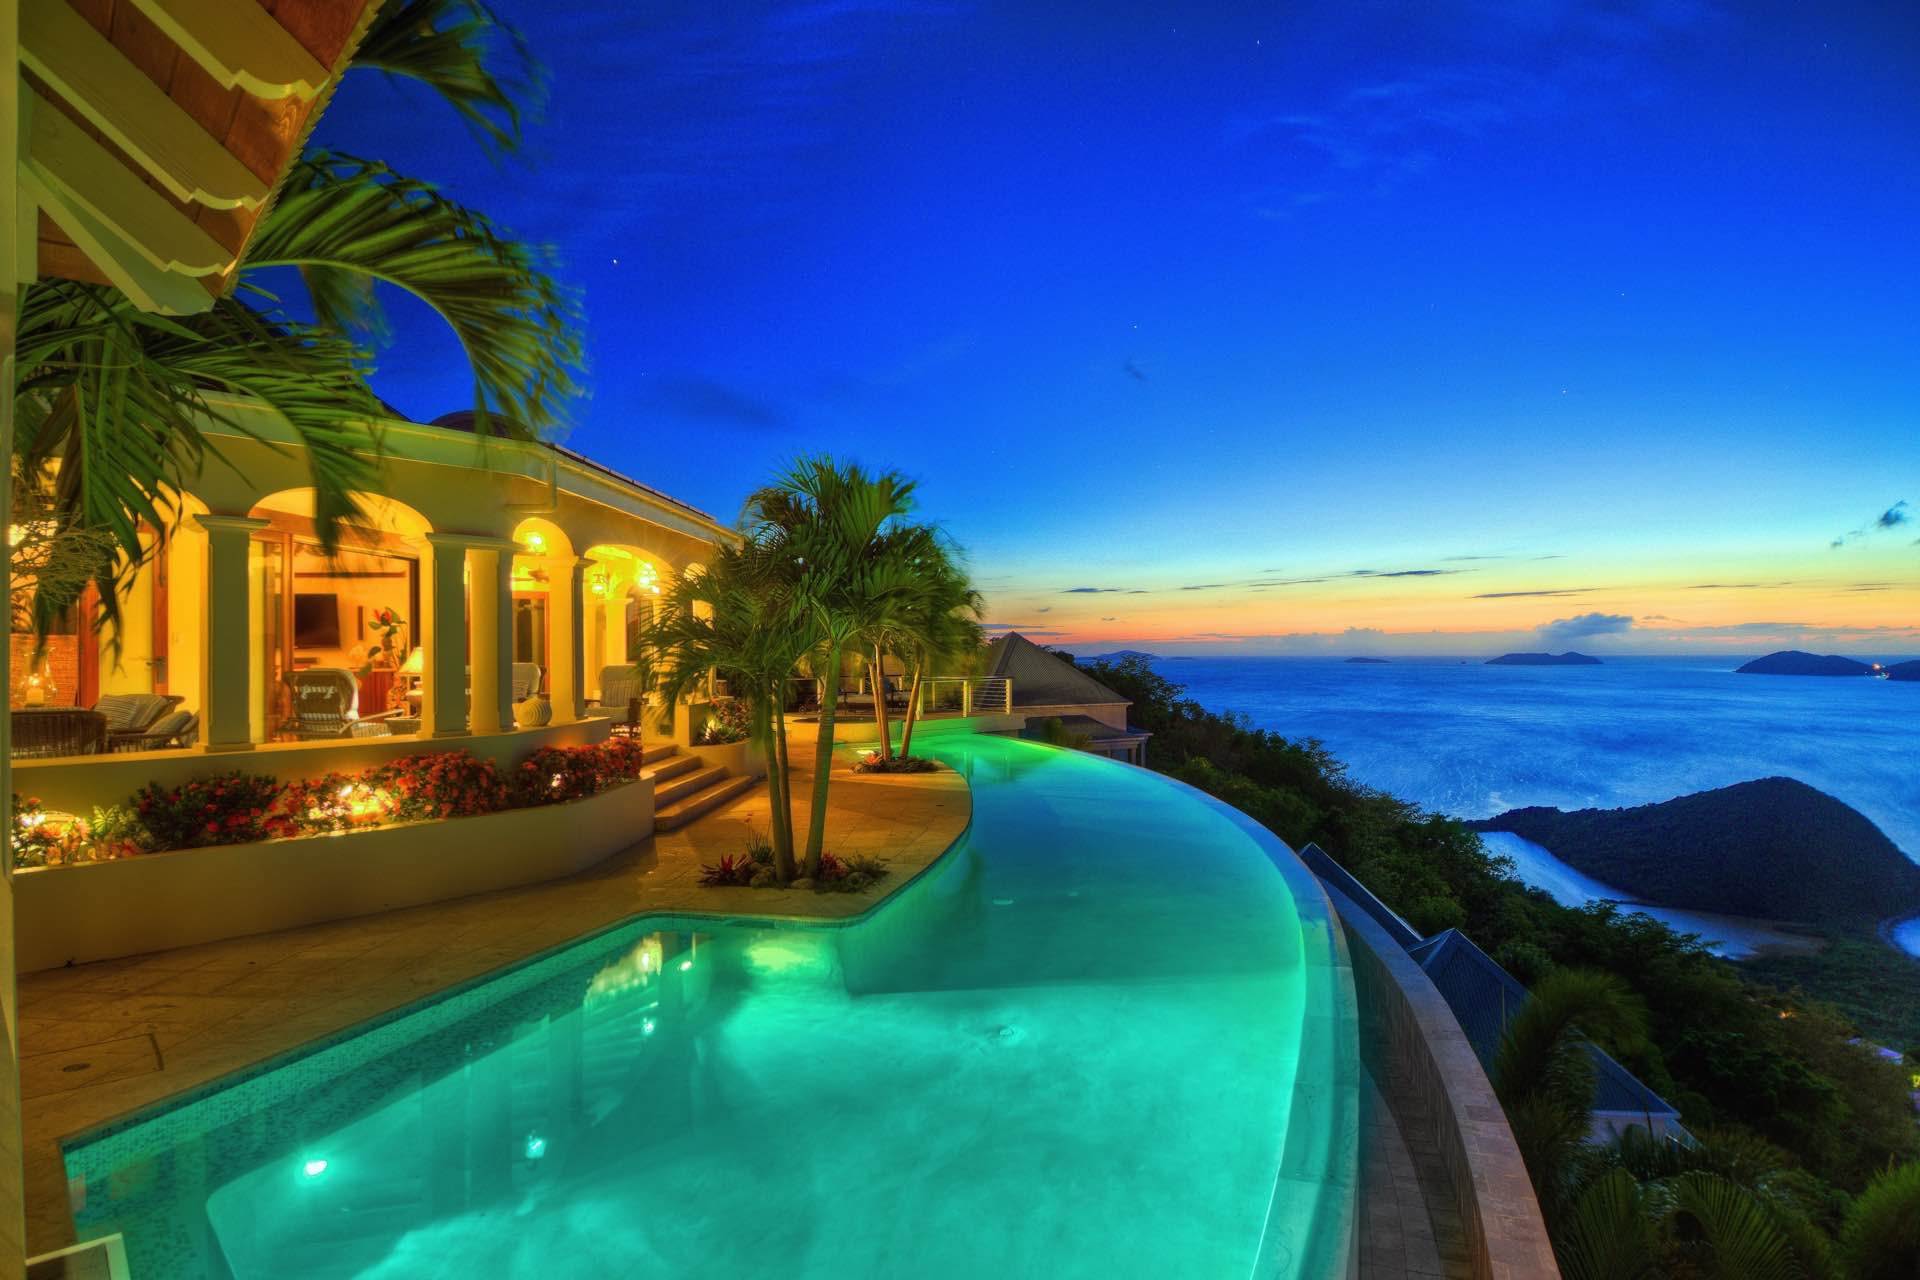 Ocean view Long term rental Long Bay BVI